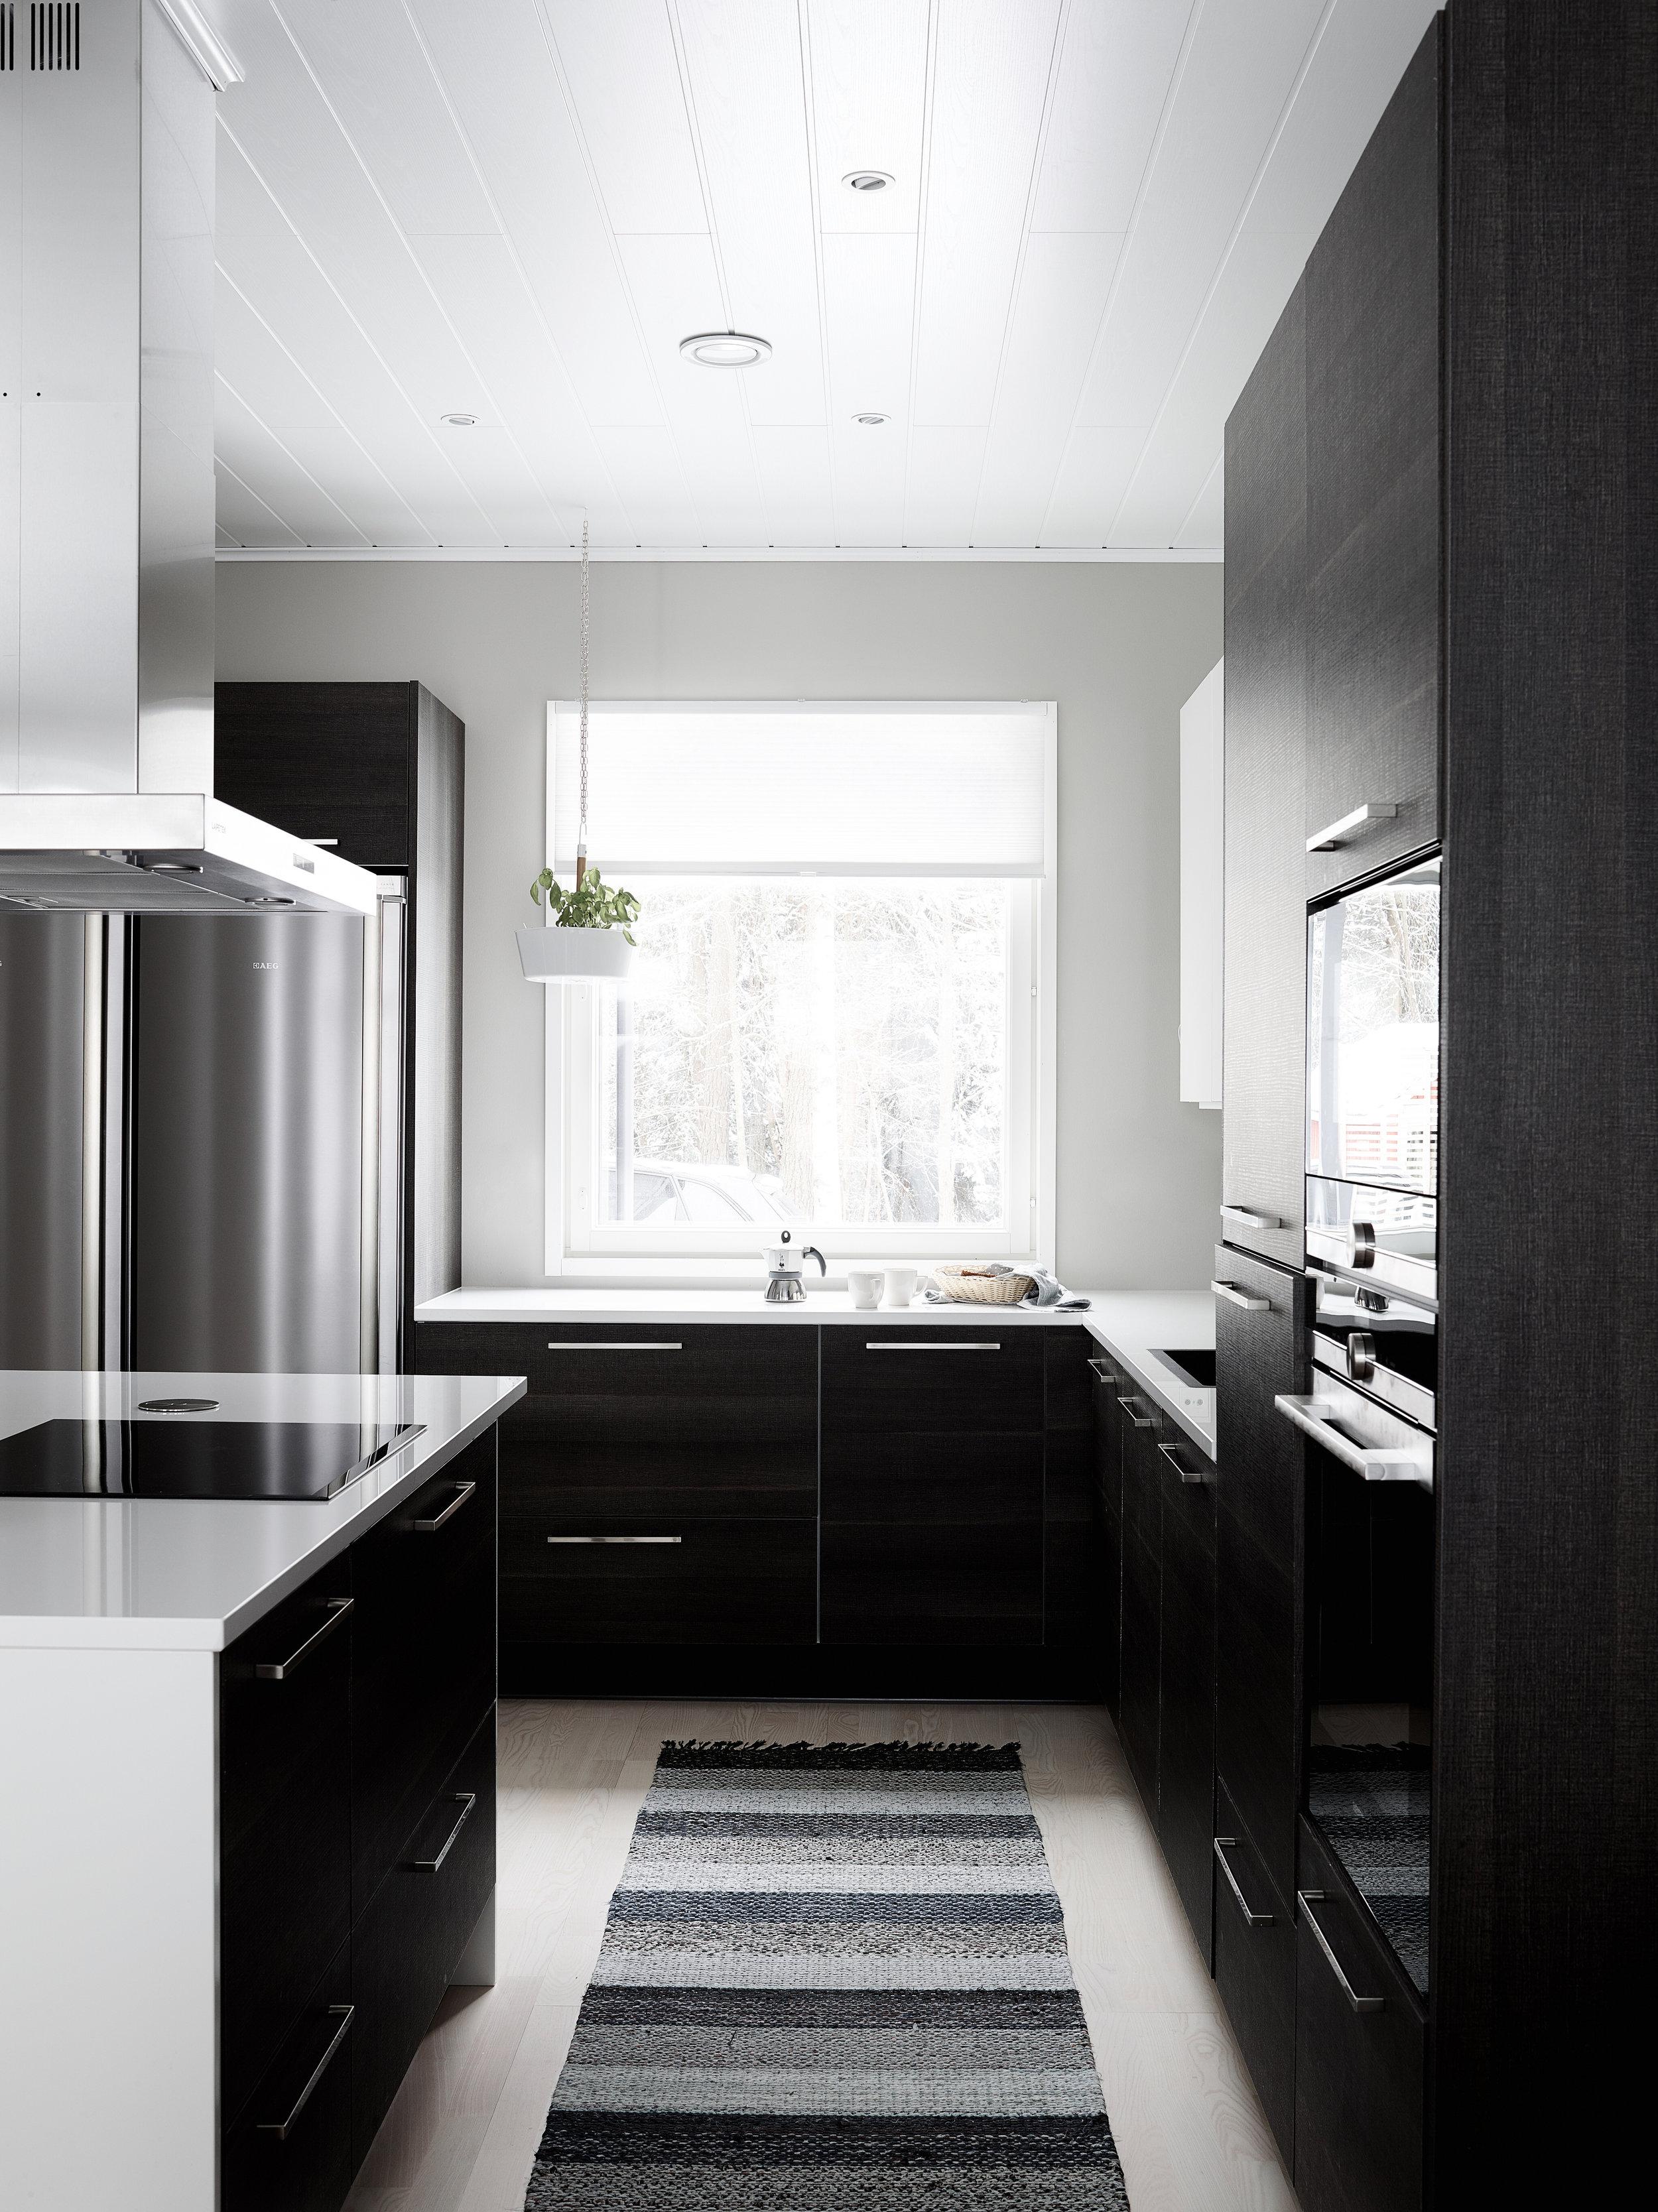 interior-anna-koponen-photo-krista-keltanen-04.jpg